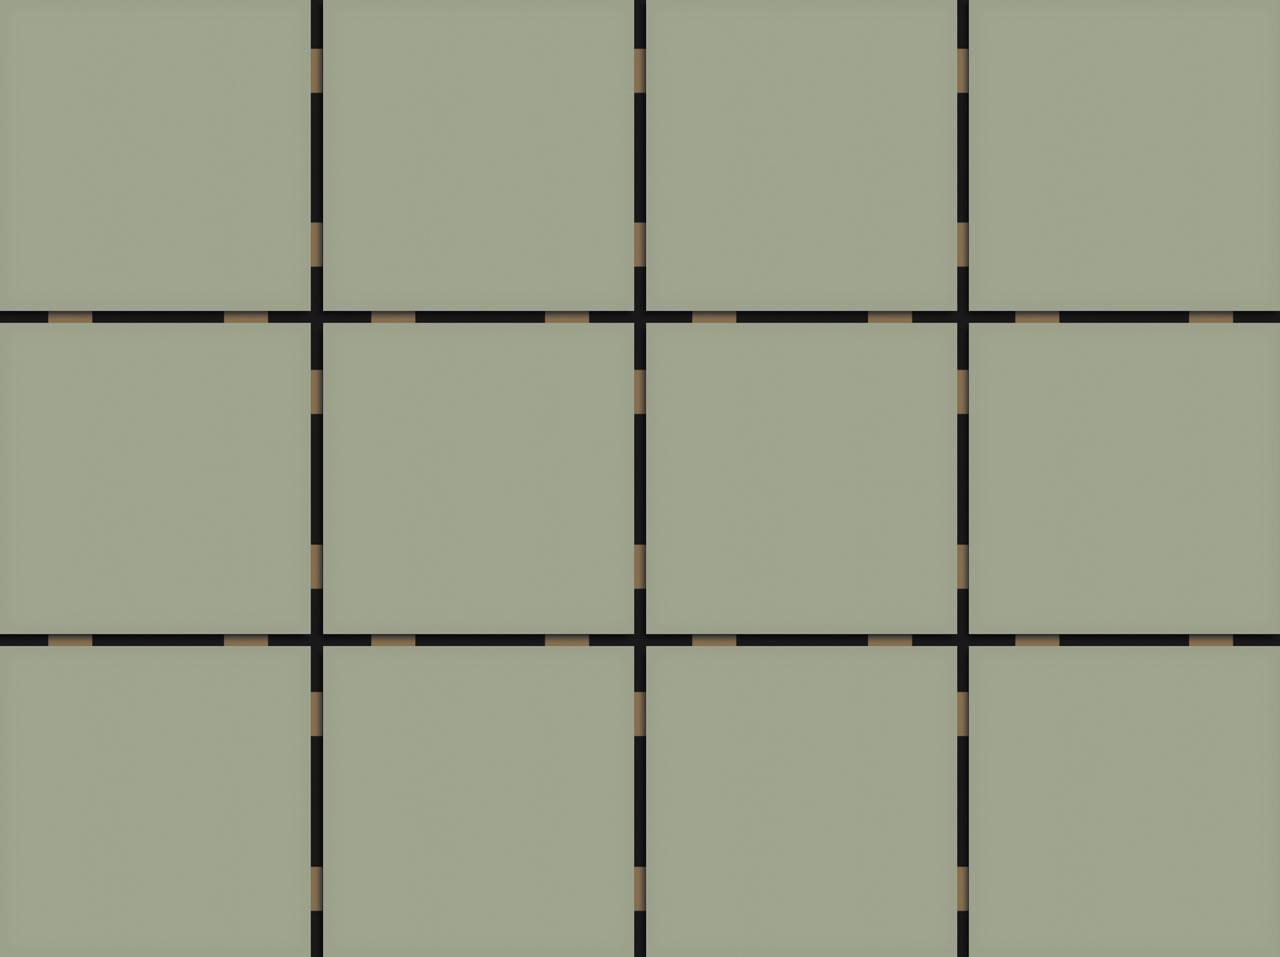 galeria jade mesh br 10×10